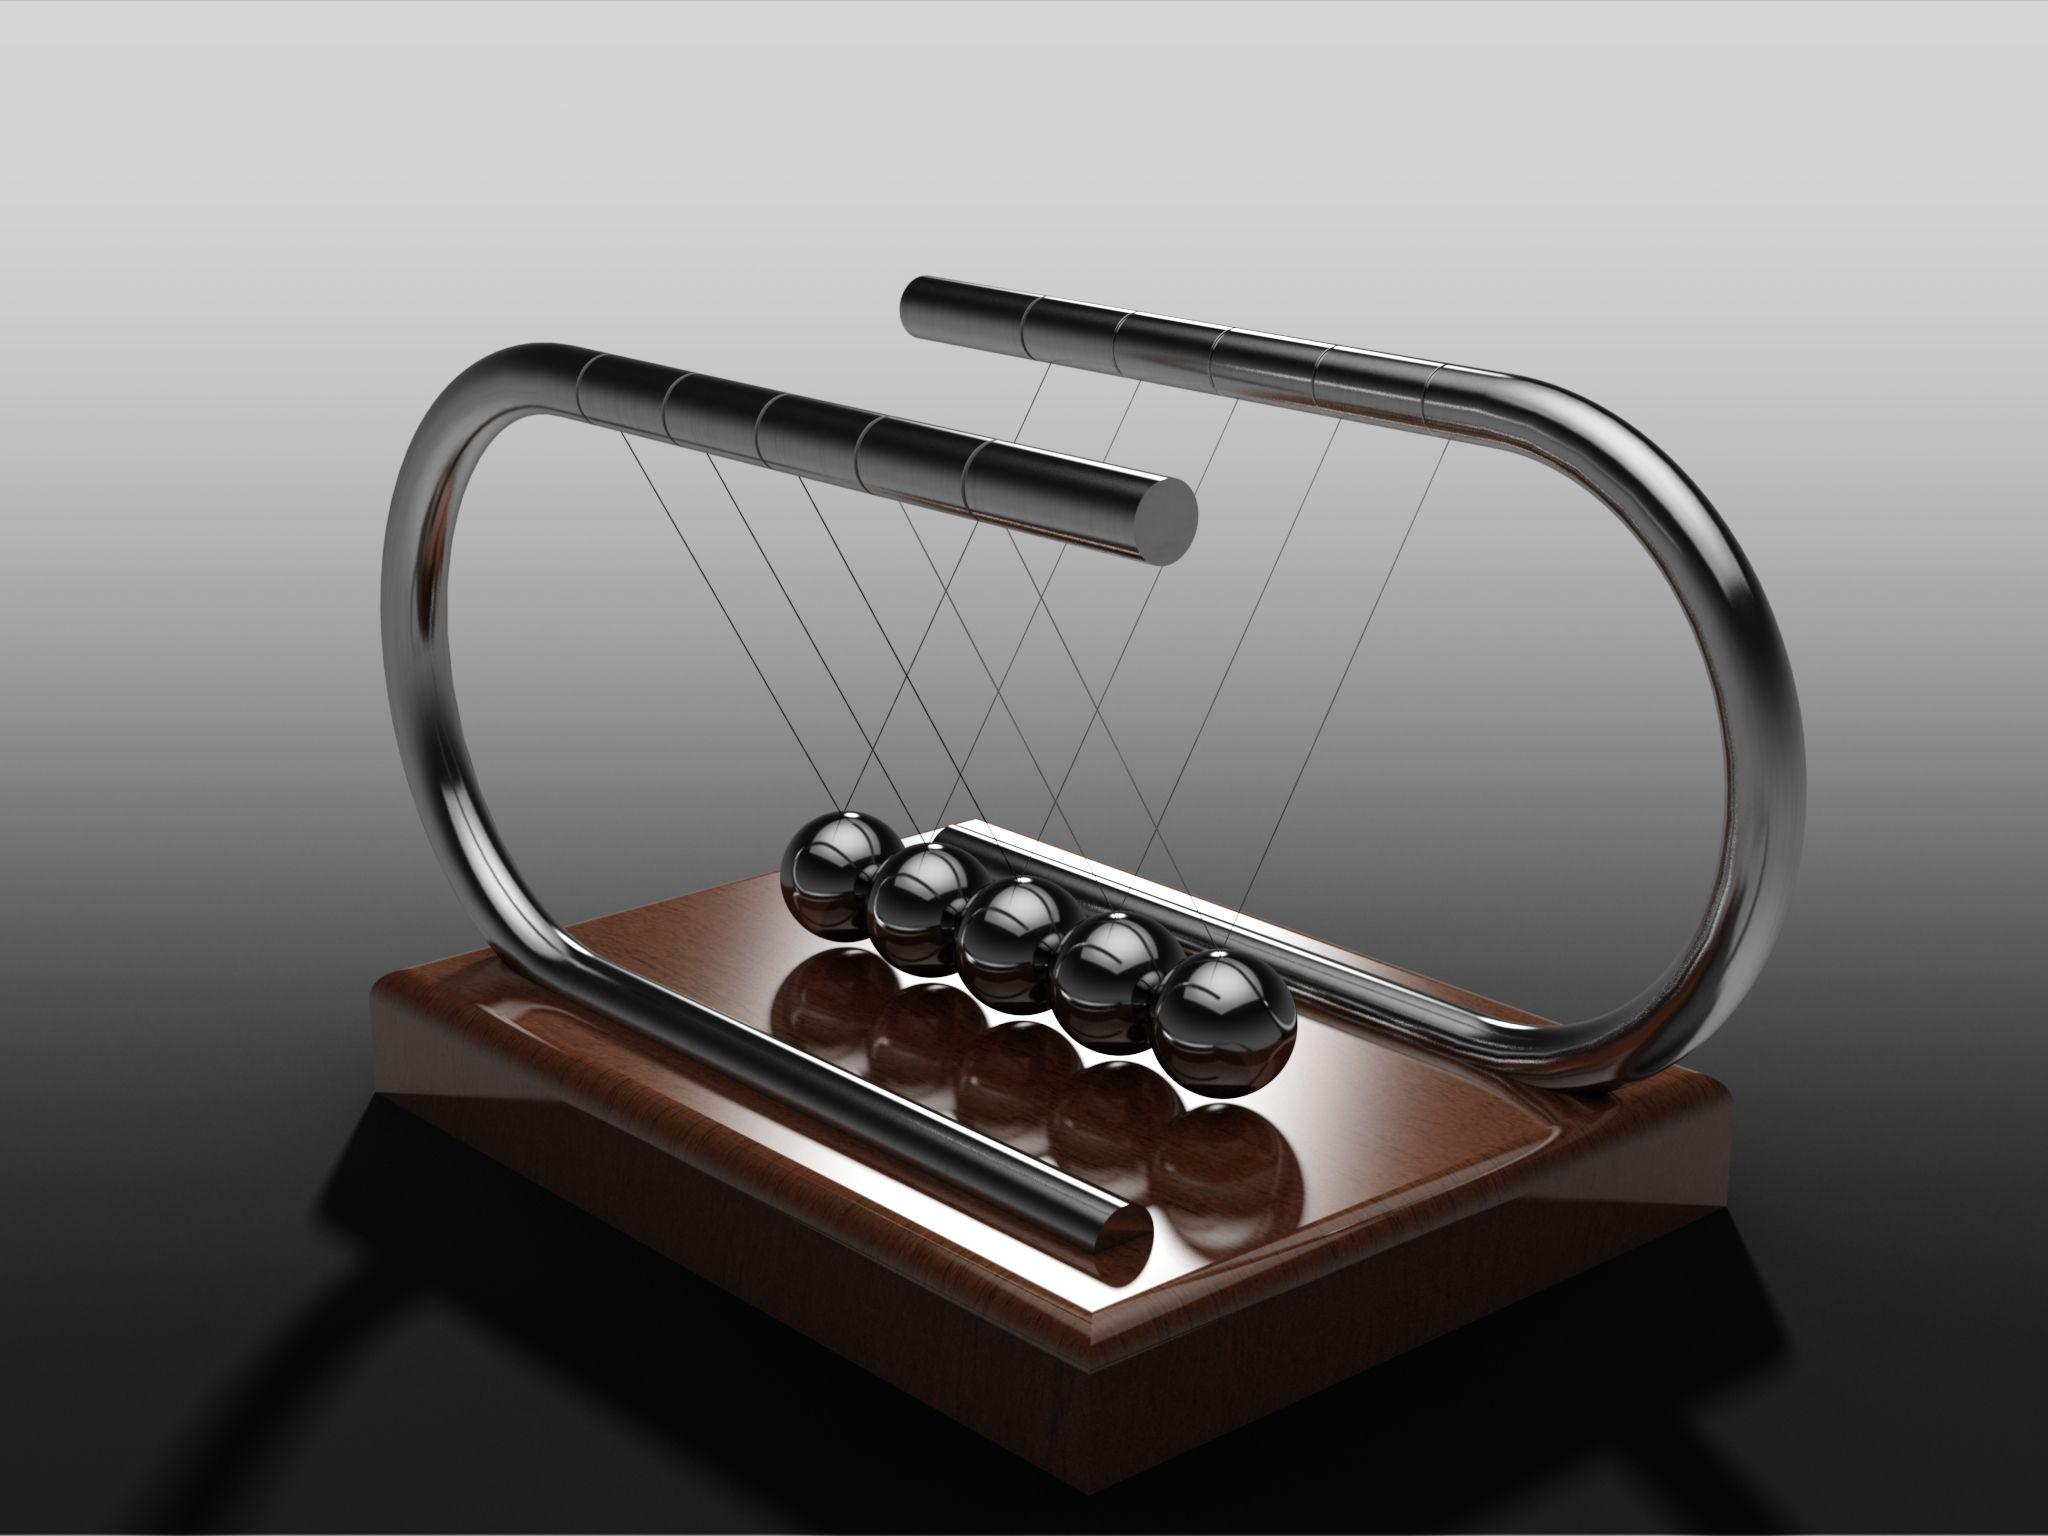 Newton S Cradle Newton S Cradle Desk Toys Minimalism Interior